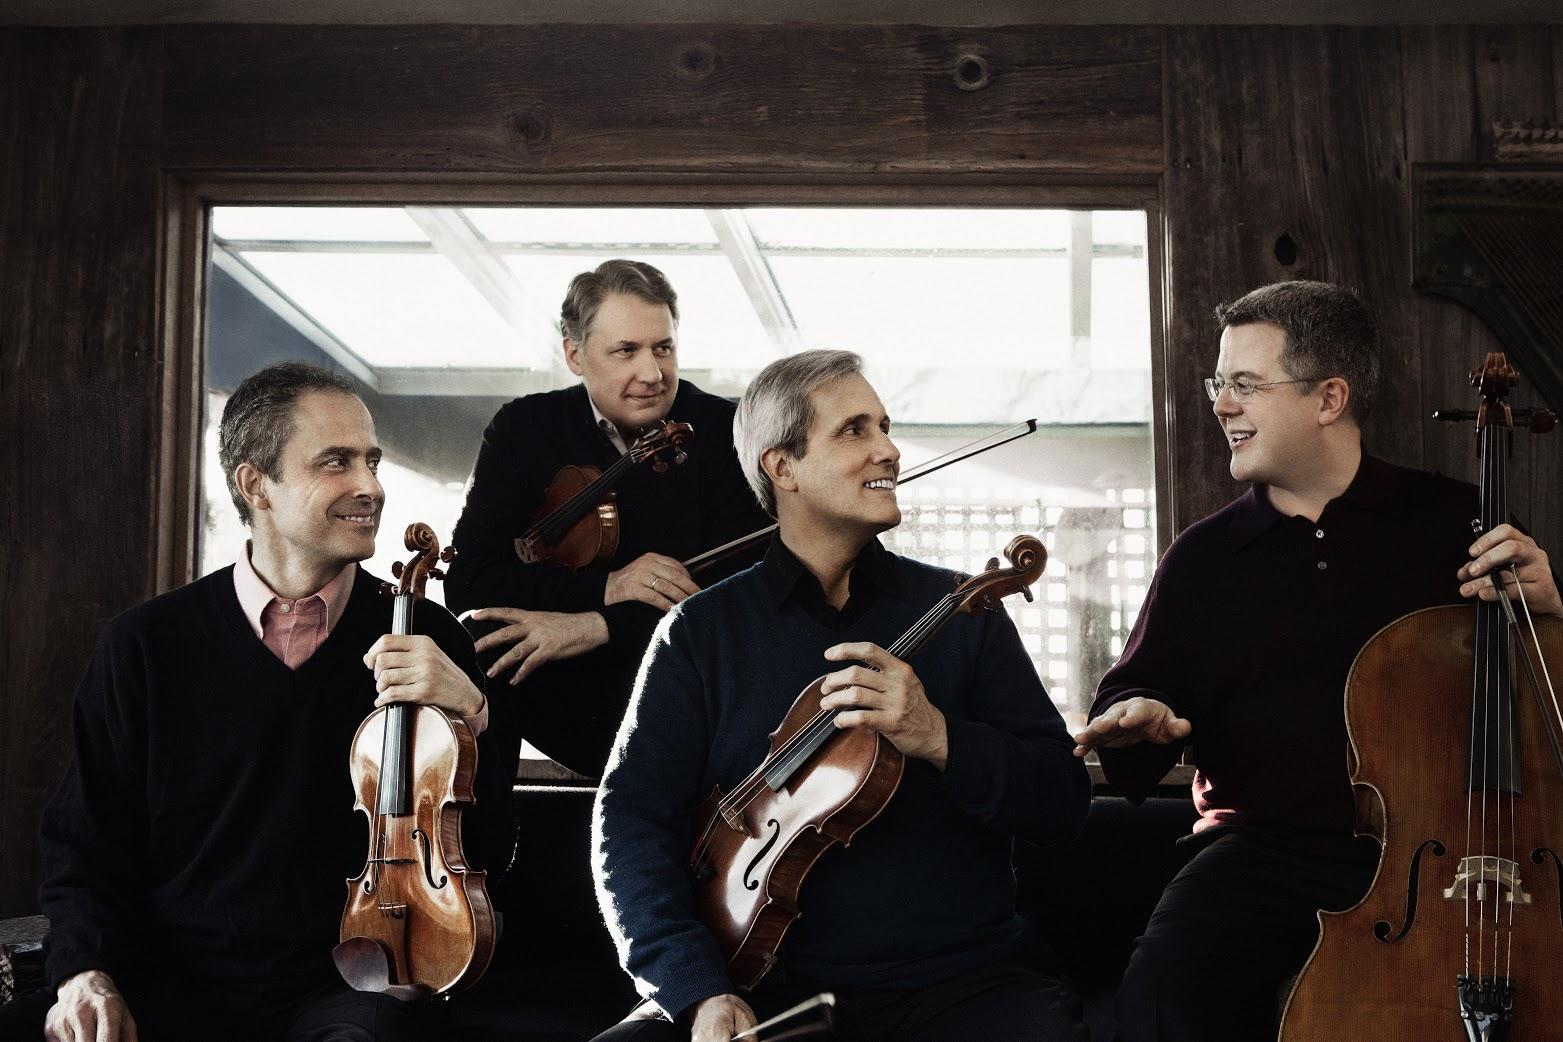 The Emerson String Quartet (Photo by Lisa-Marie-Mazzucco)